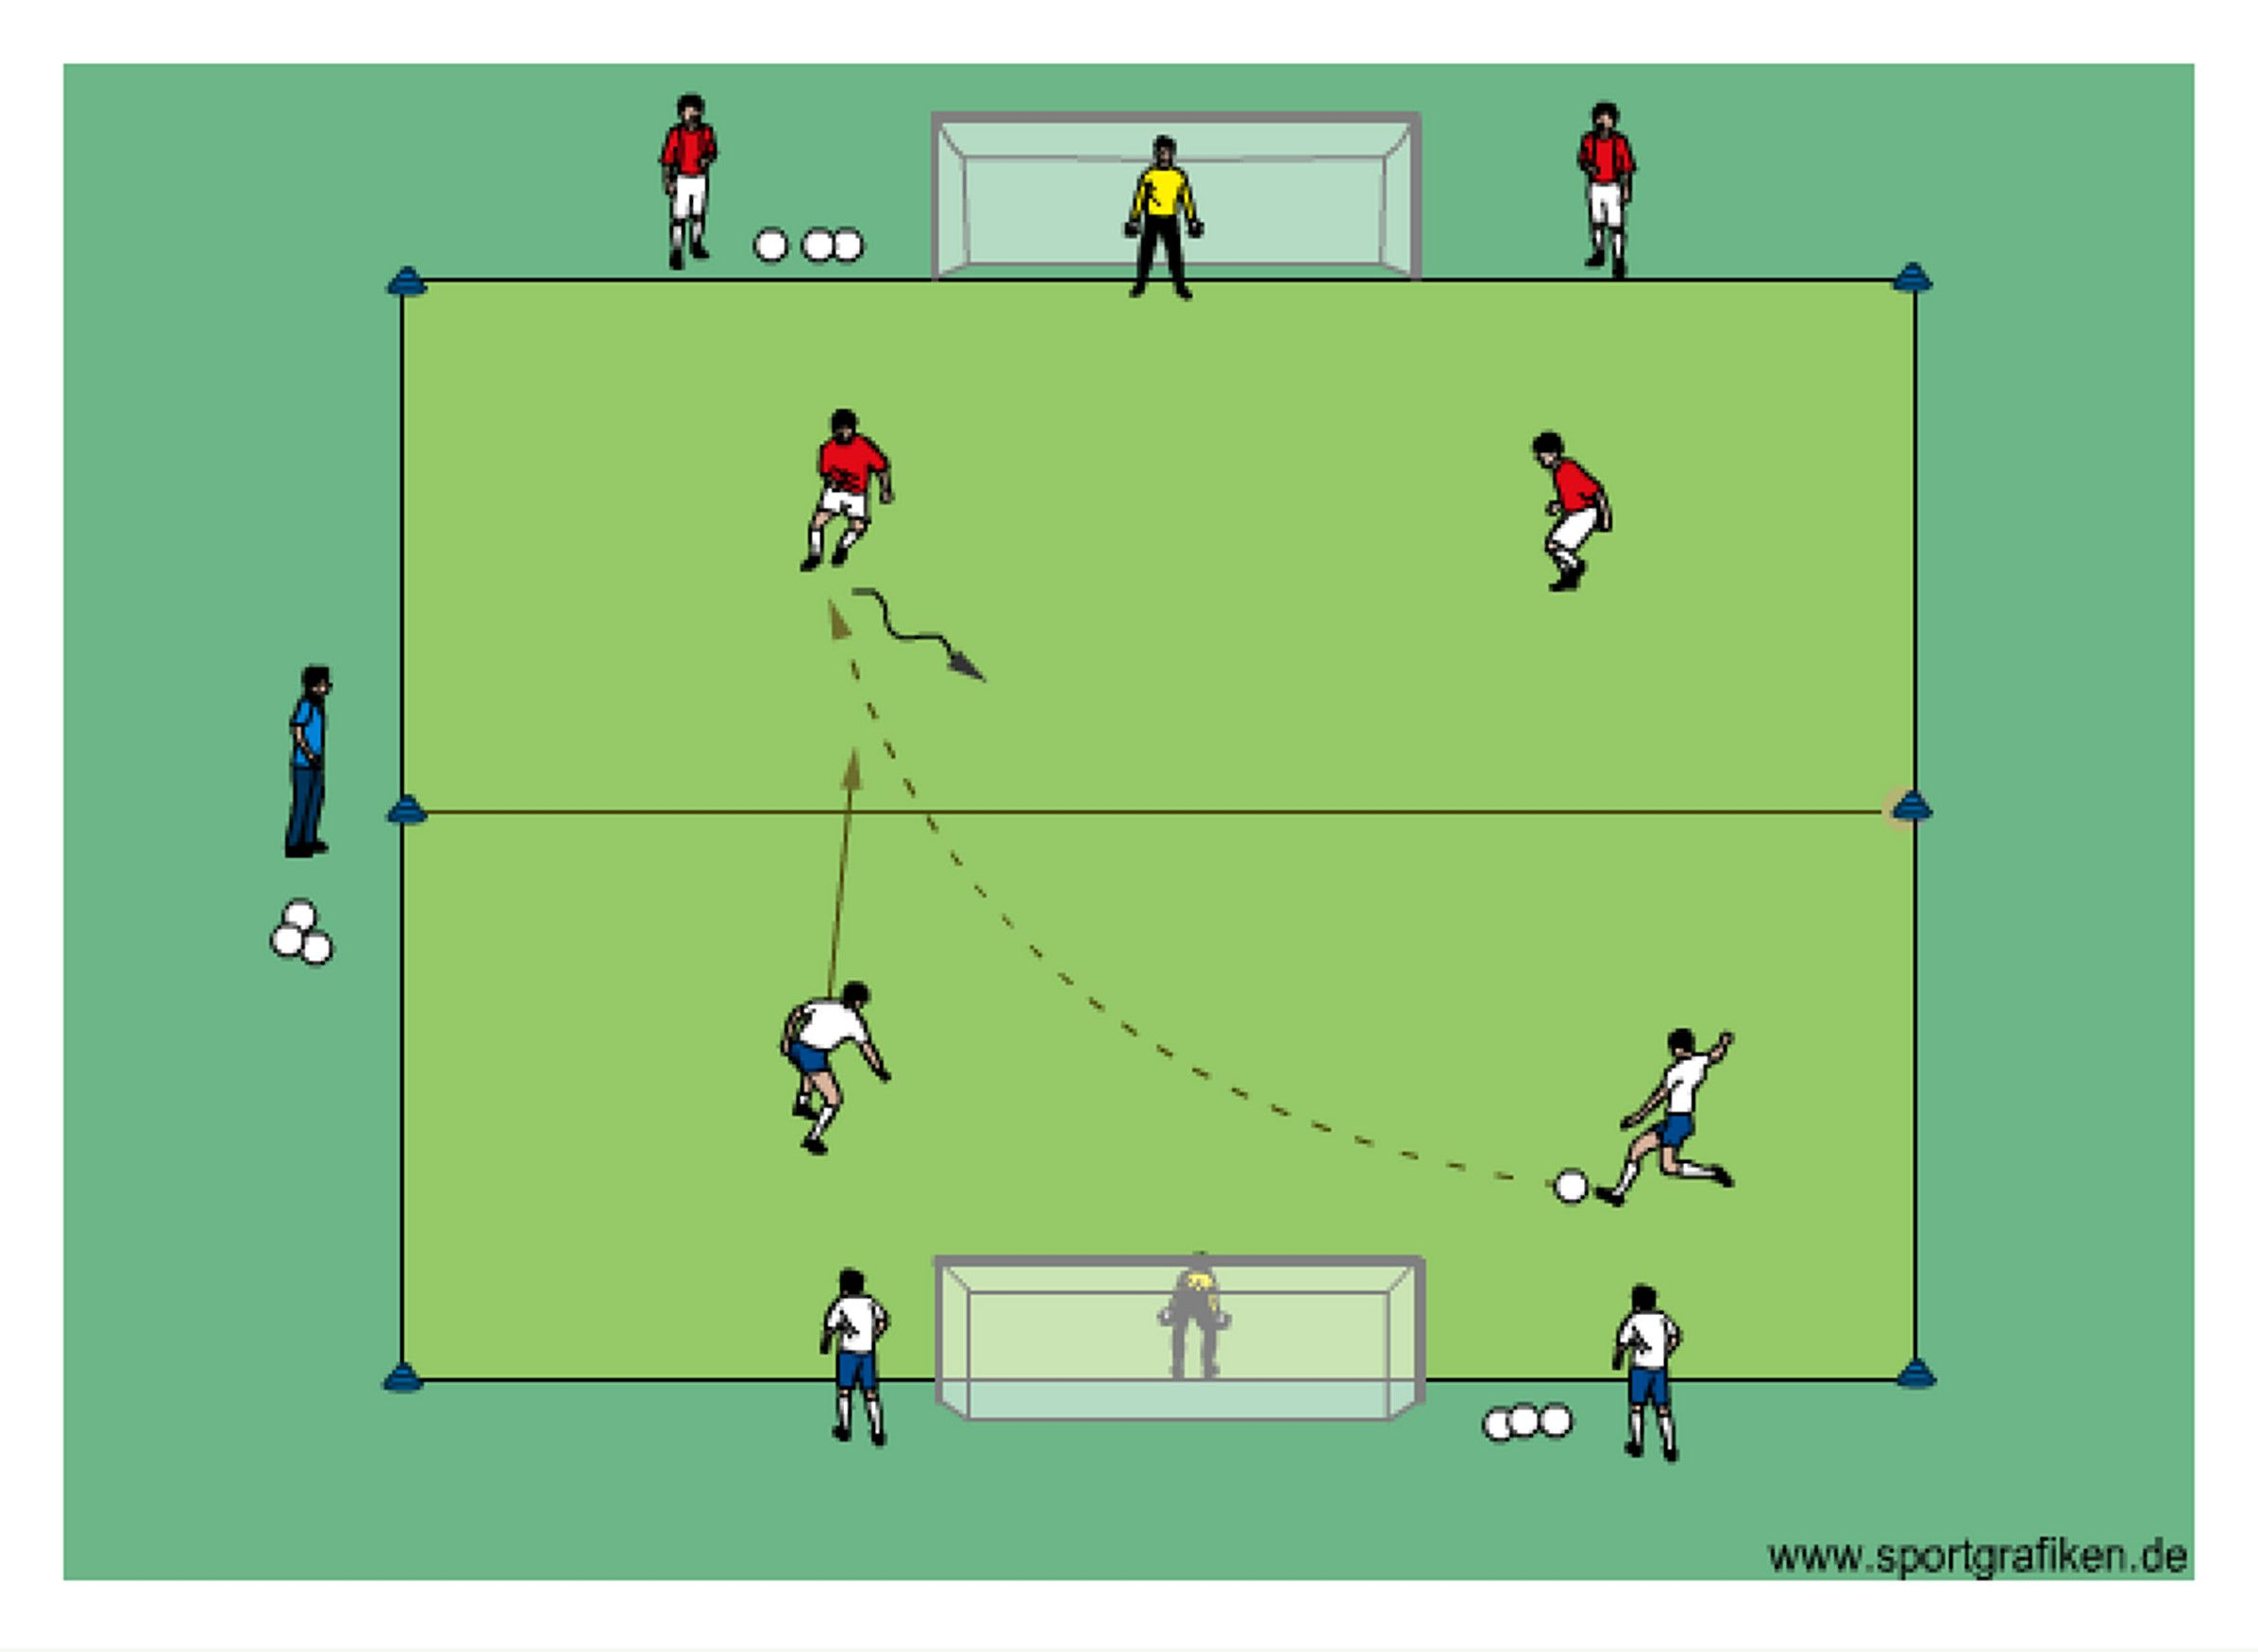 46+ Football games online multiplayer ideas